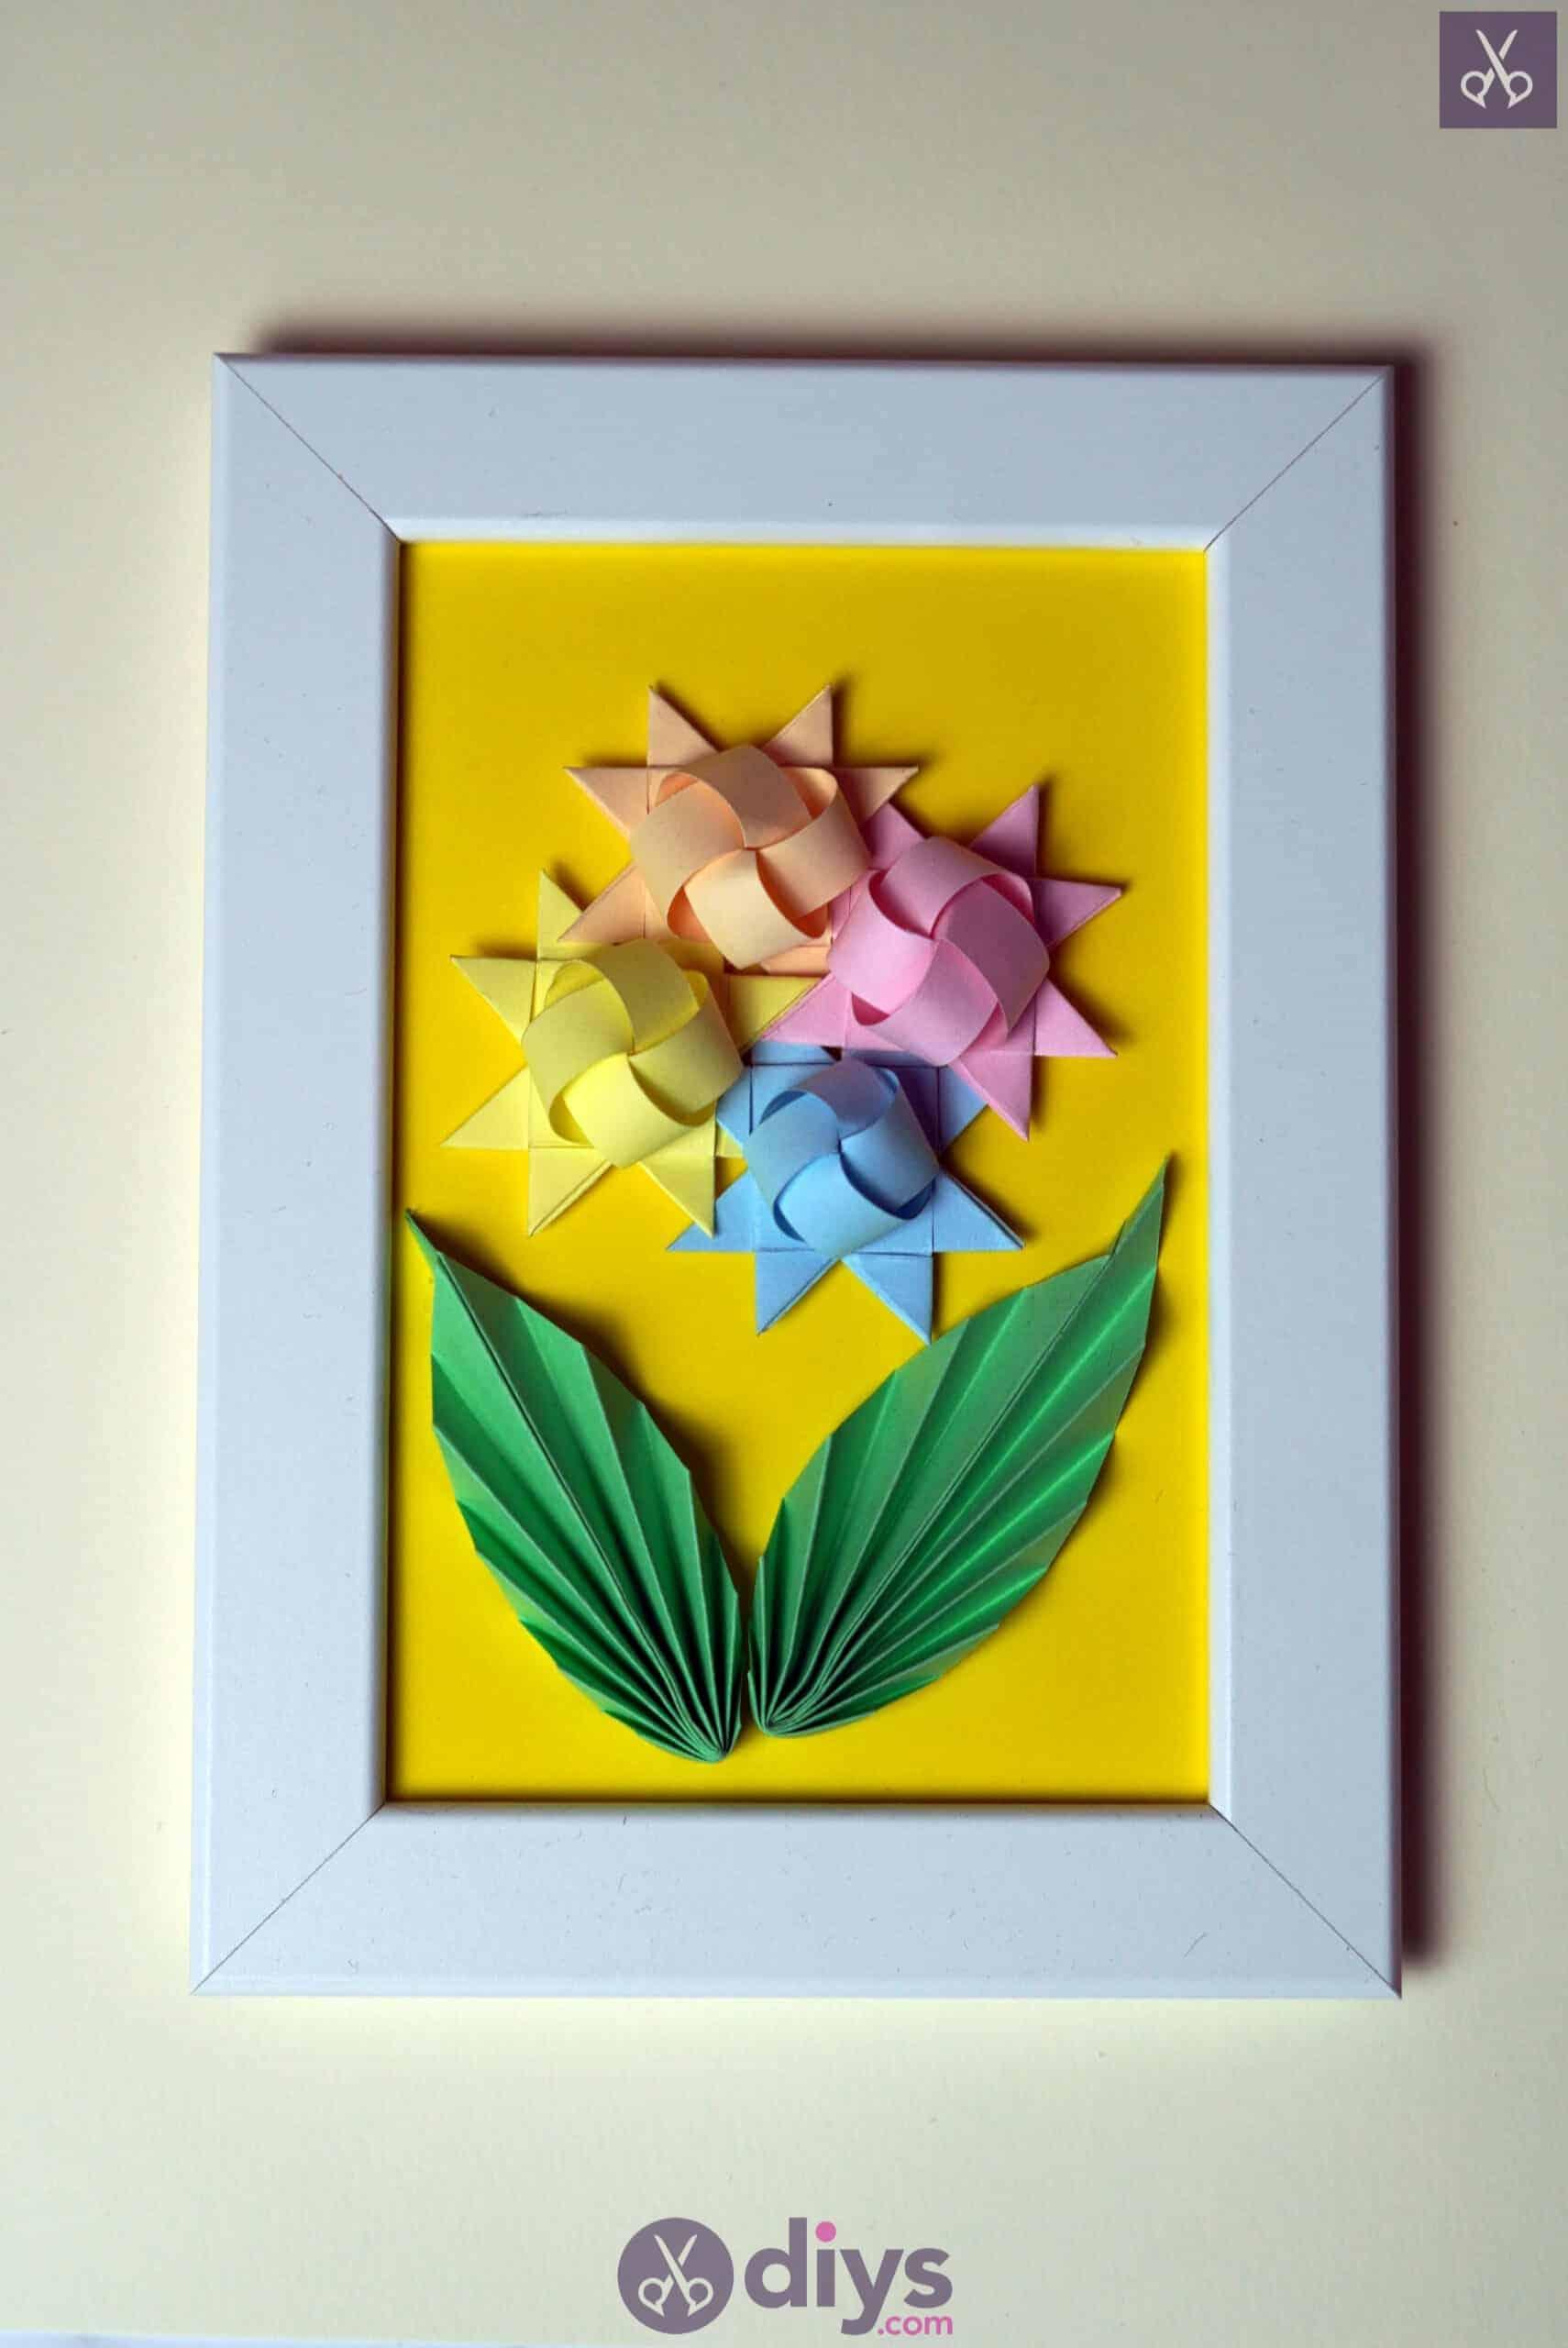 Diy origami flower art colorful